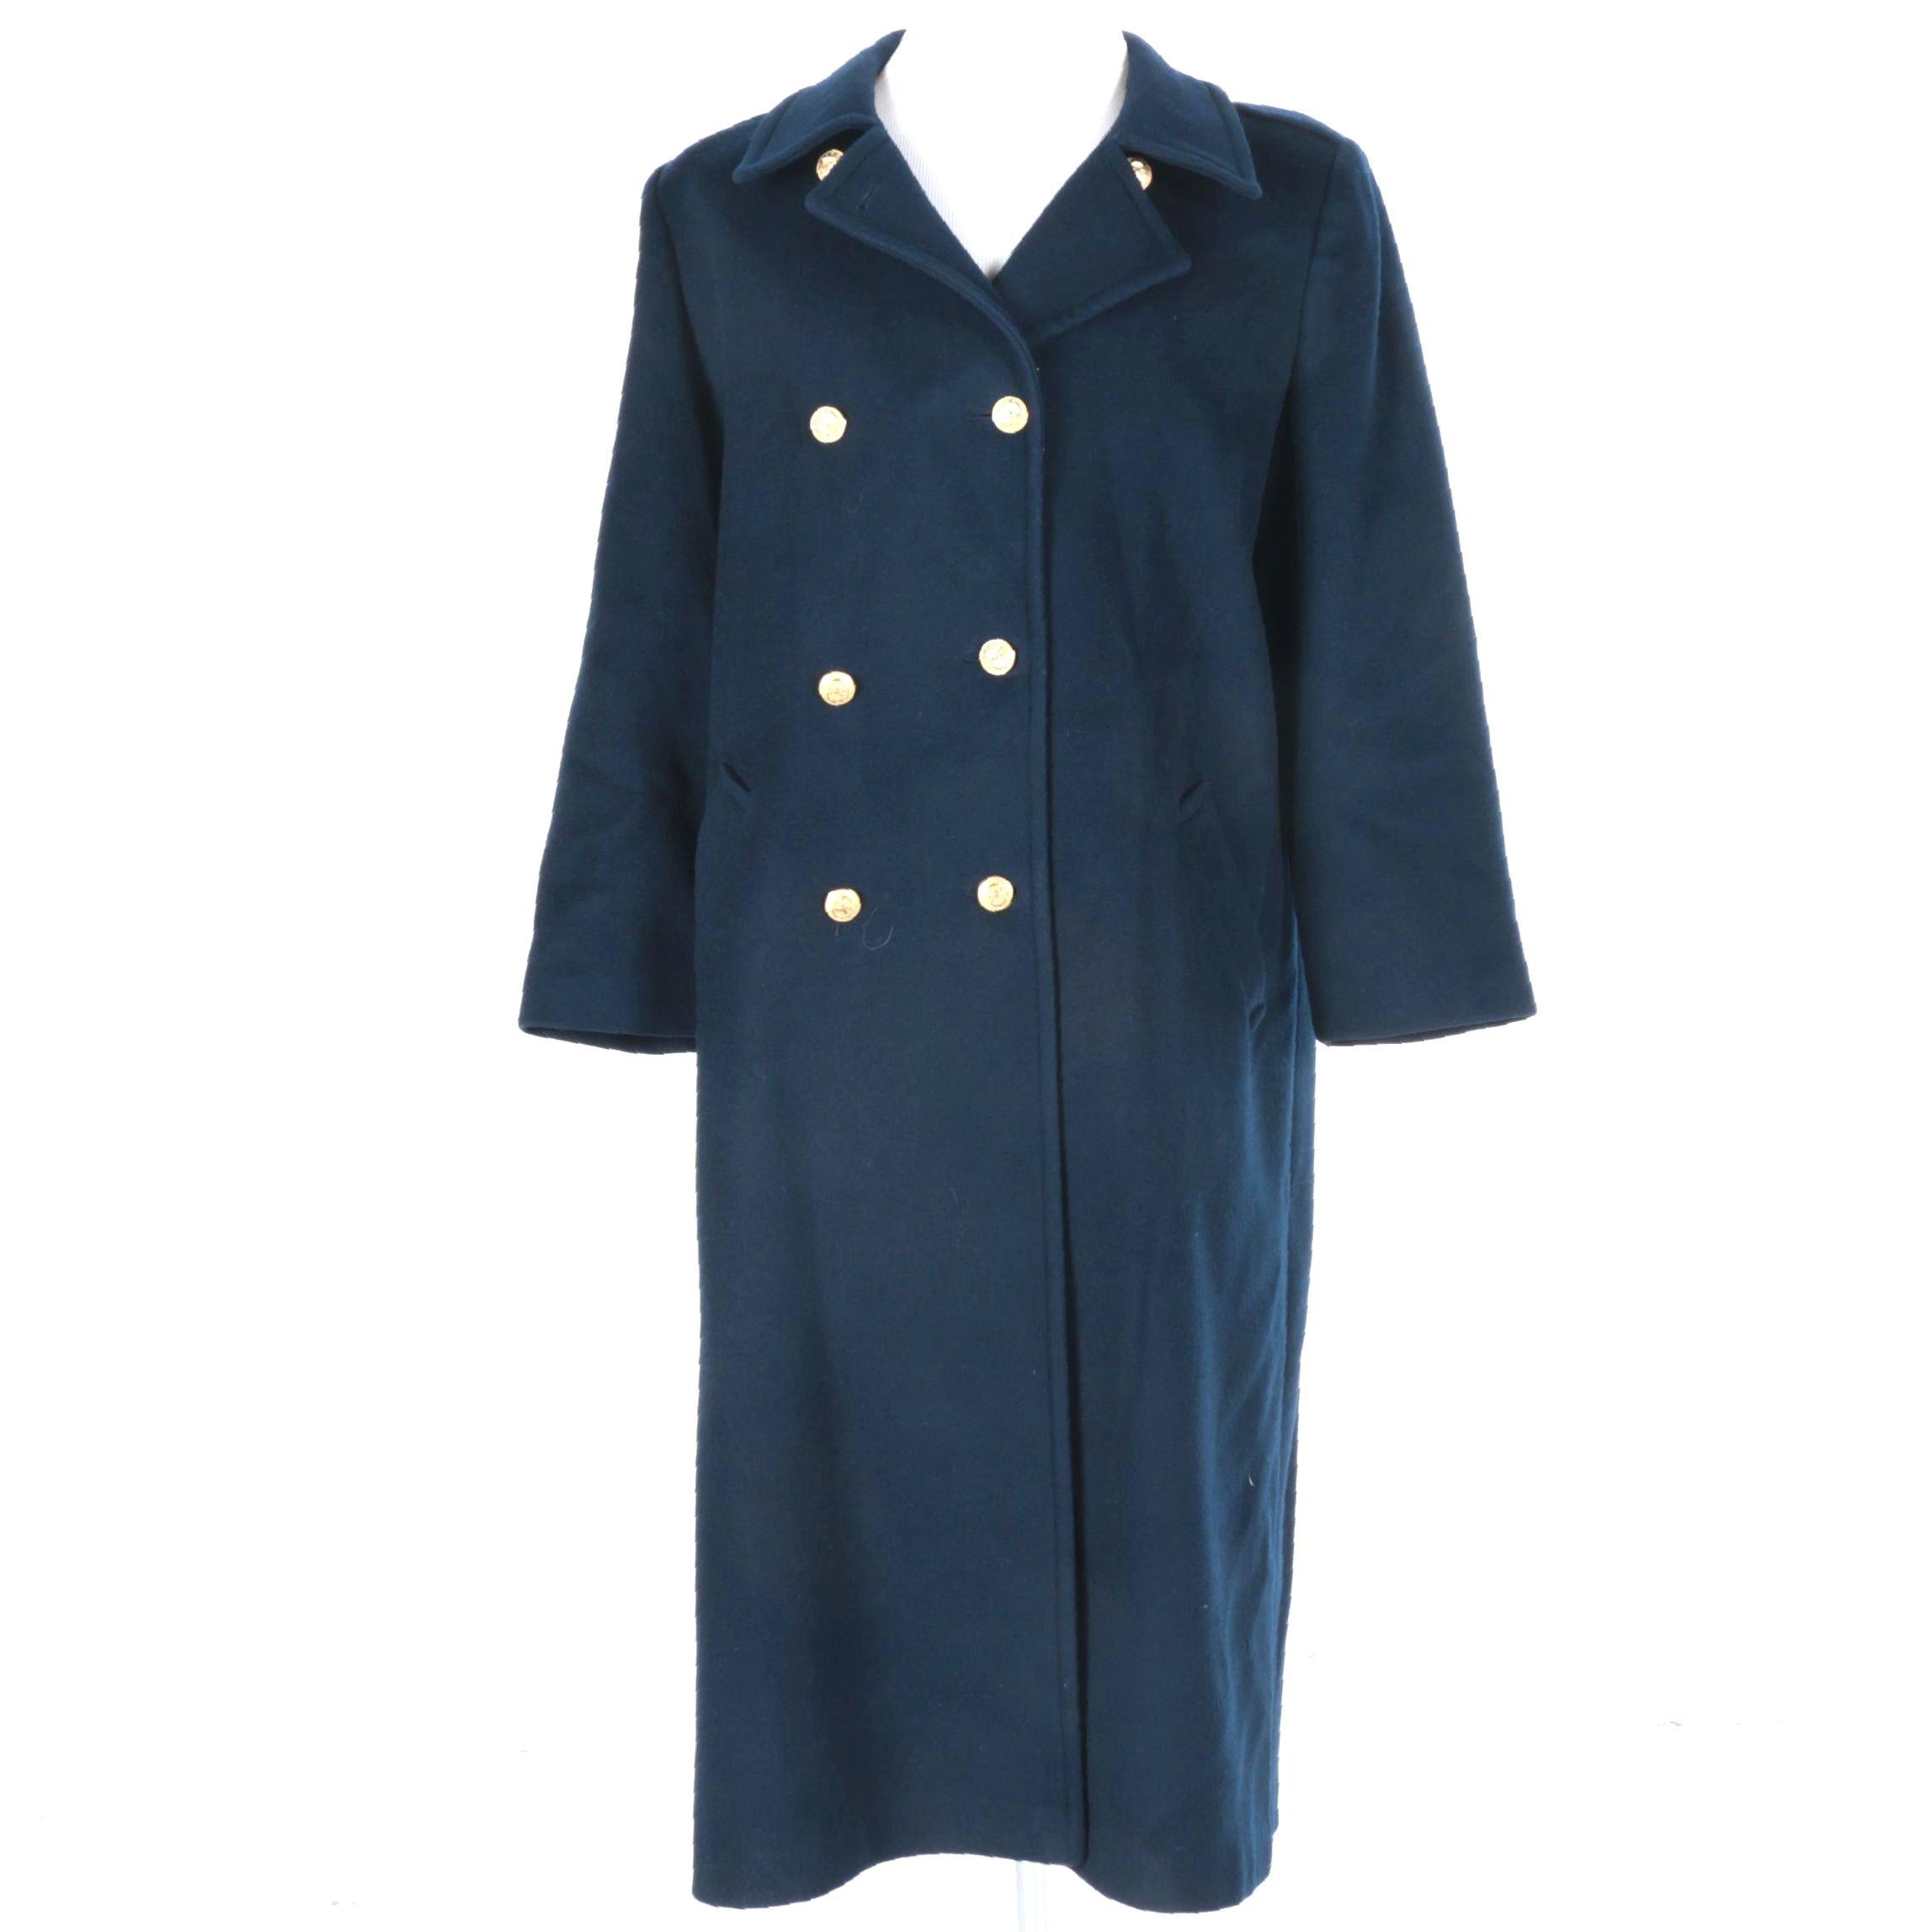 Forecaster of Boston Navy Wool Coat